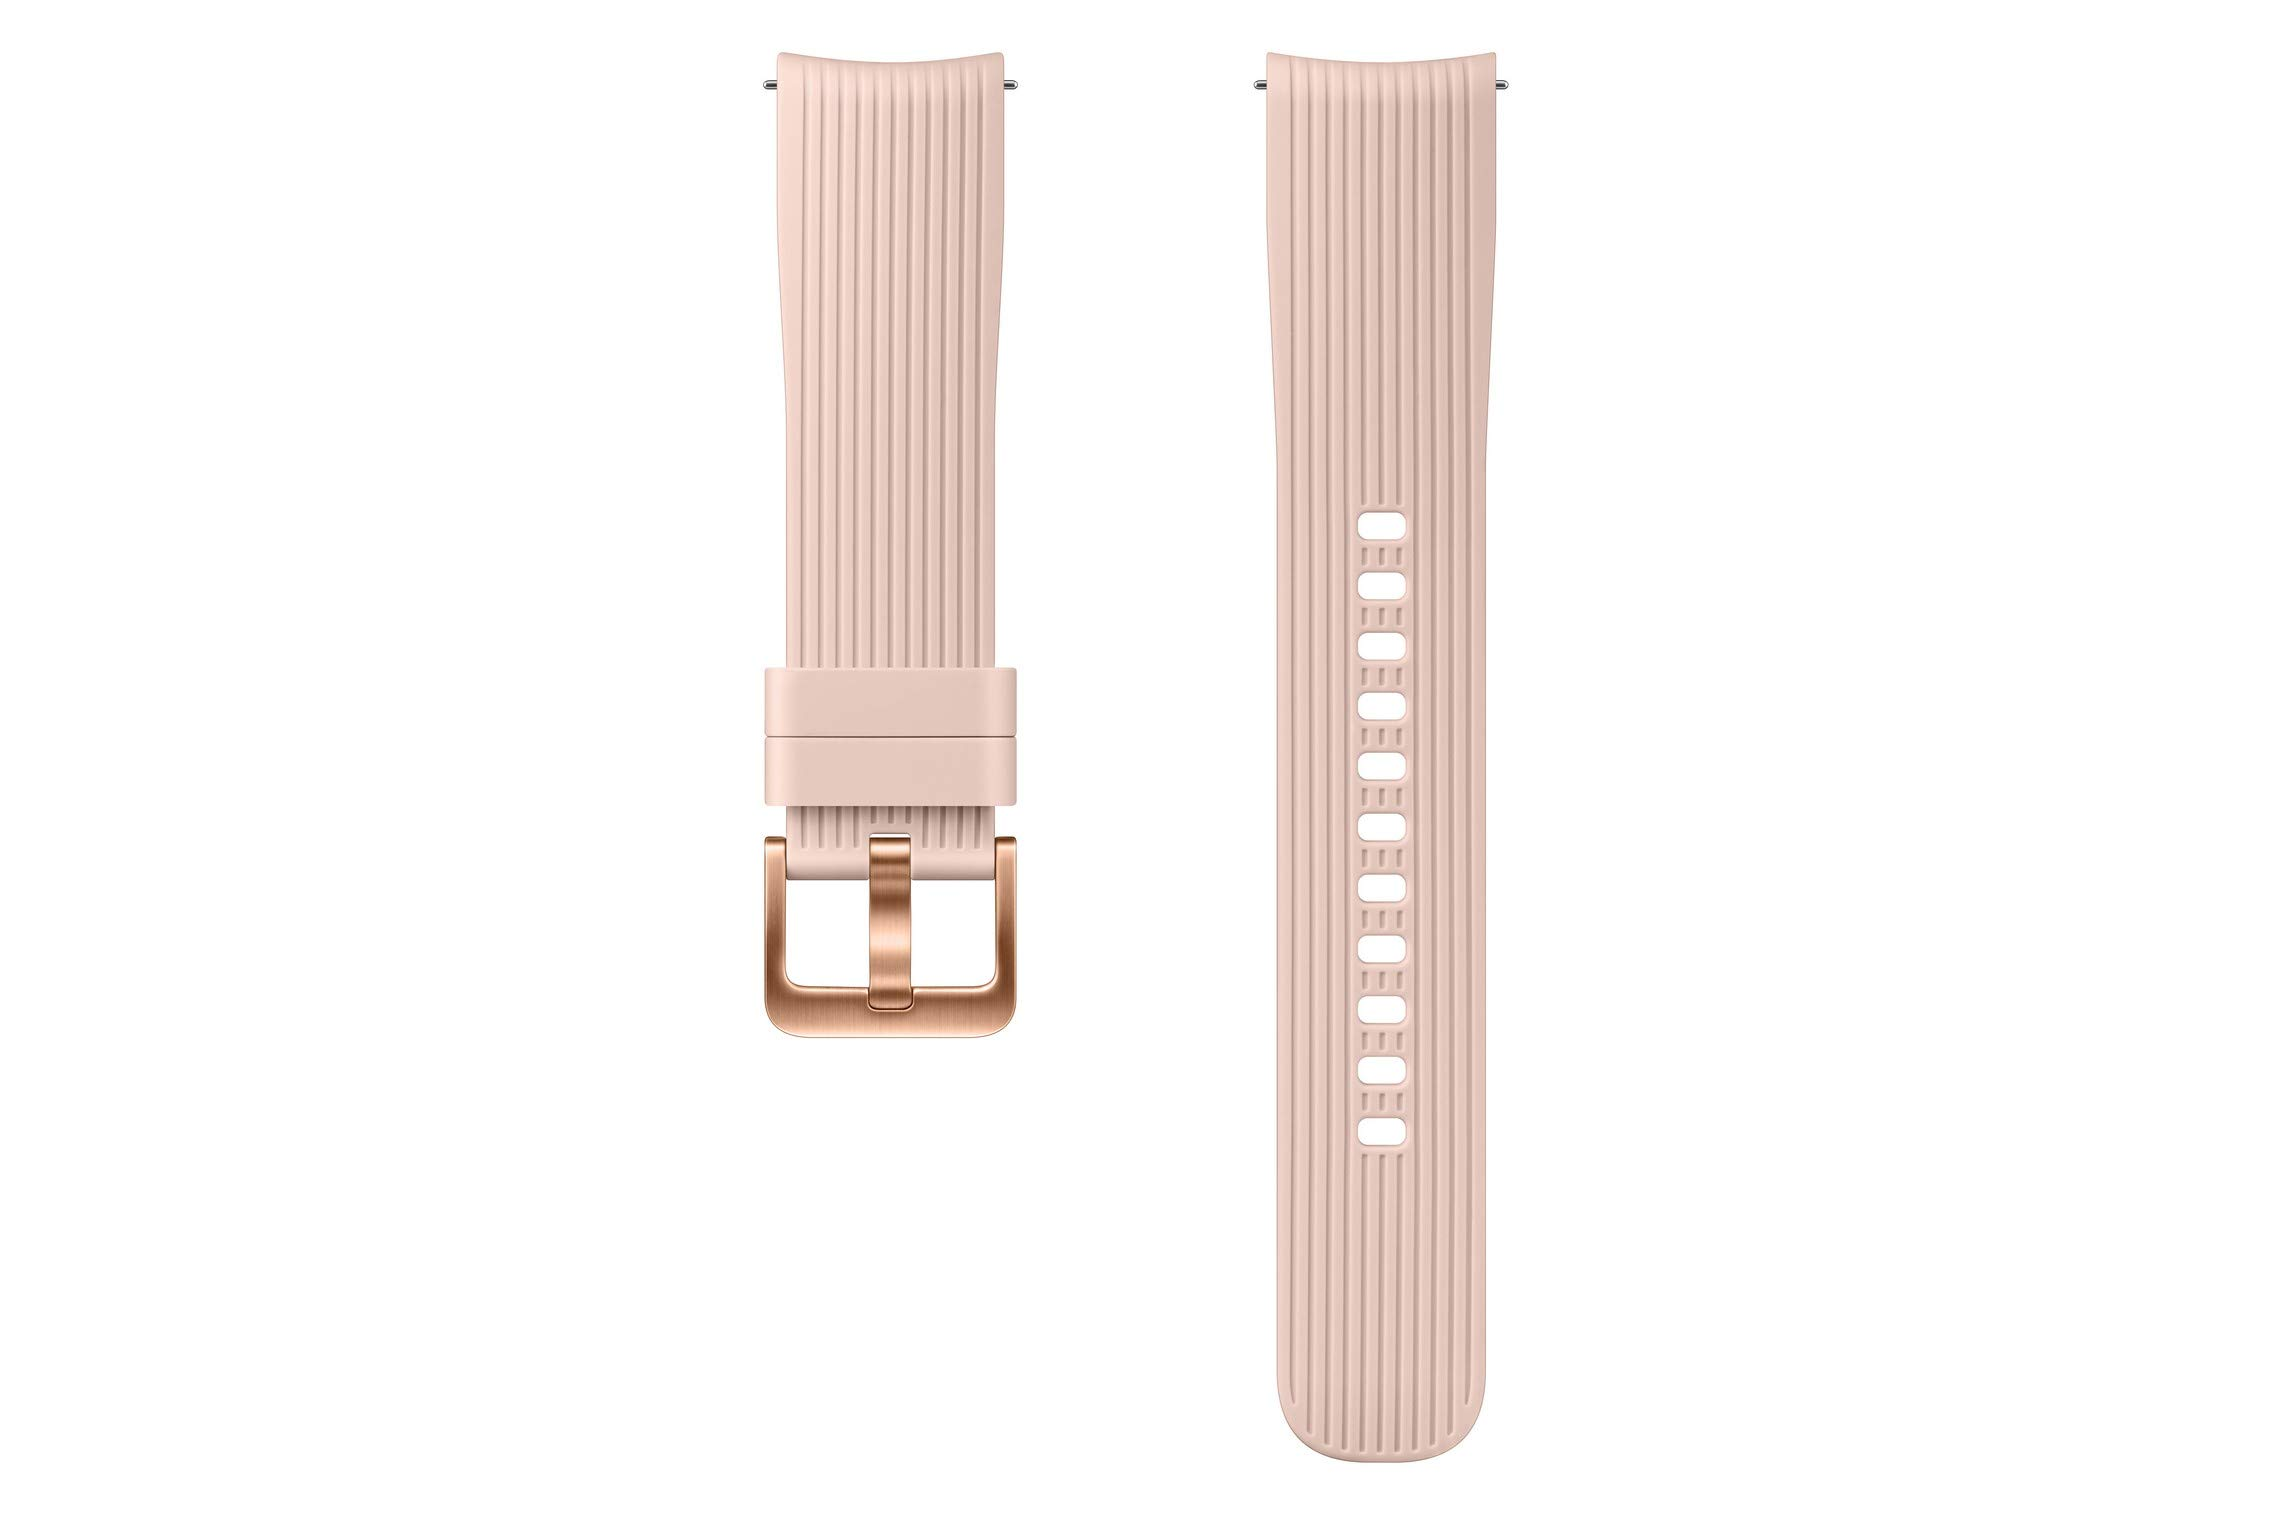 Samsung-Silikon-Armband-fr-Galaxy-Watch